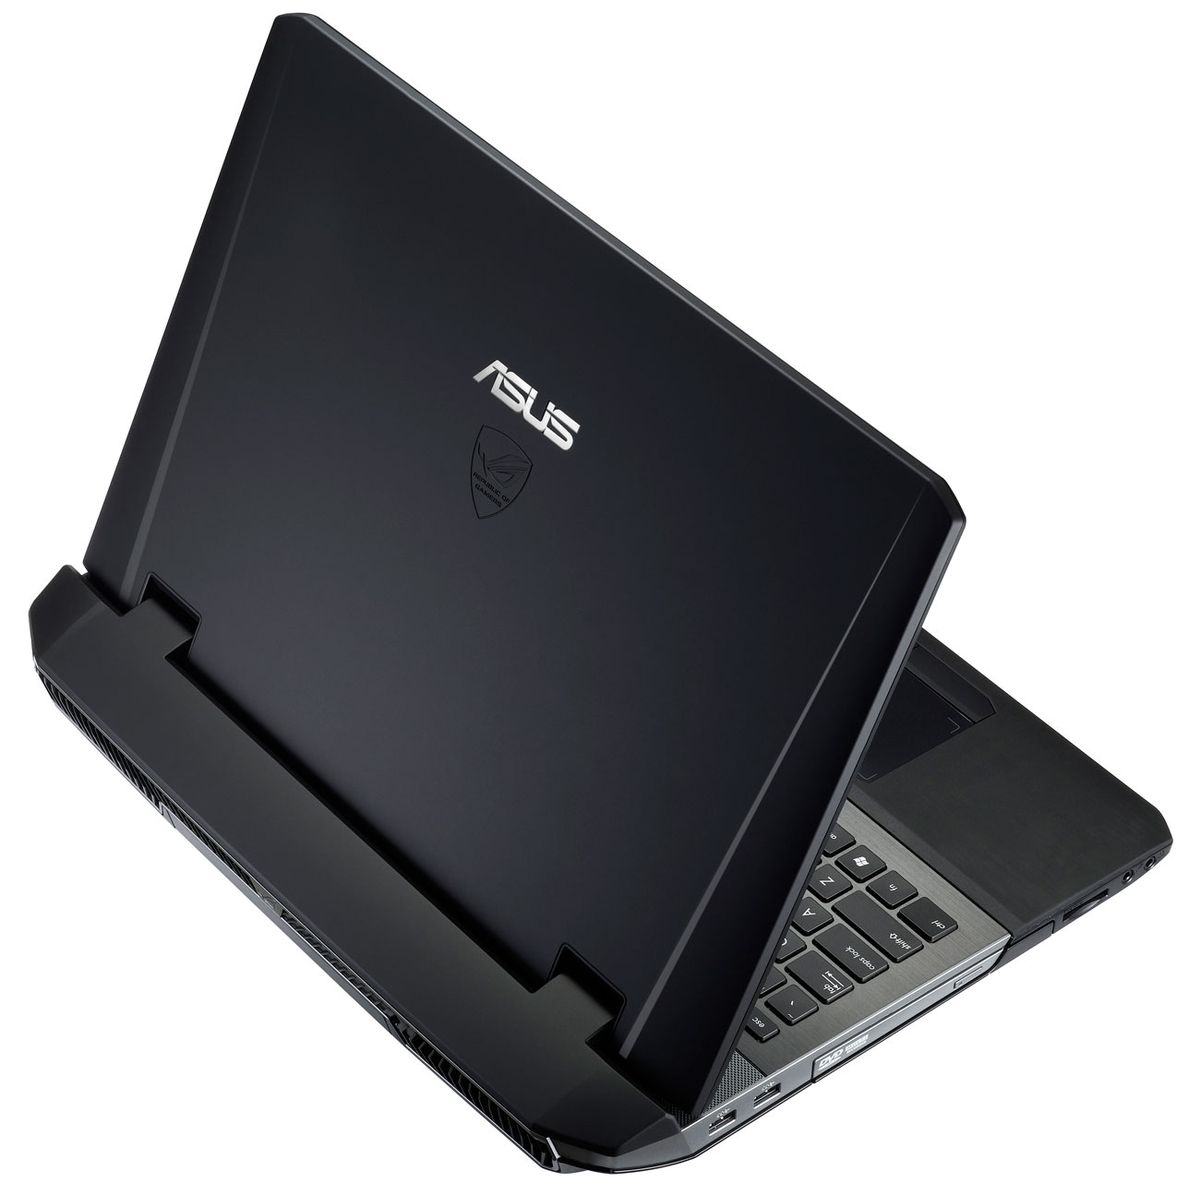 "Asus G75VX-T4198H à 1499€, 17.3"" Full HD mat : GTX 670MX, Blu-Ray, Core i7 Ivy Bridge, 16 Go, 7200tr"